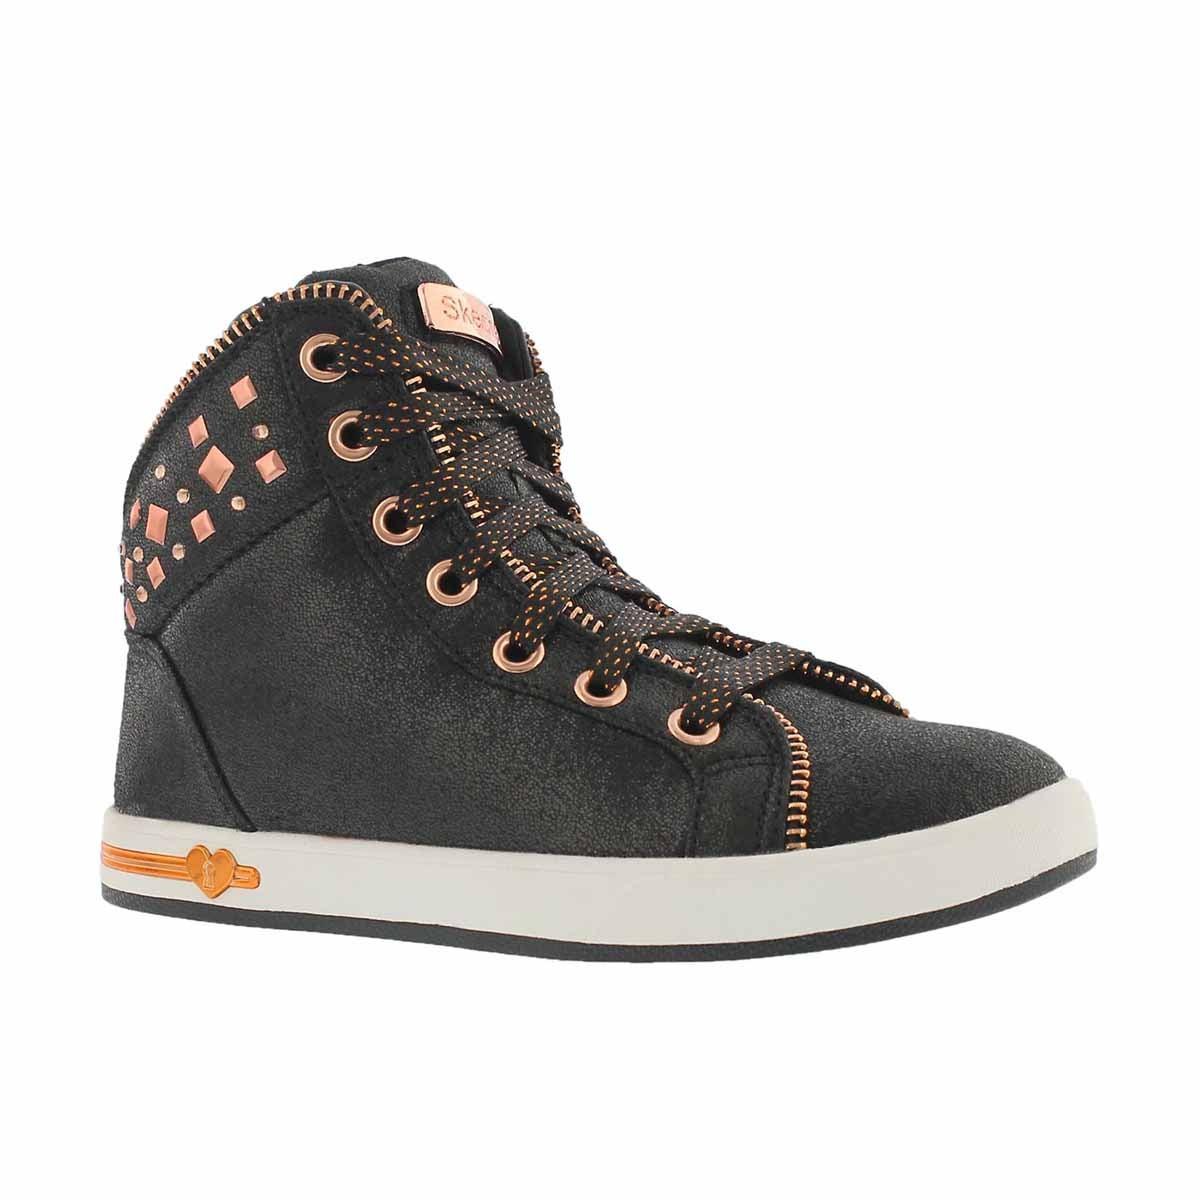 Girls' SHOUTOUTS ZIPSTERS black hi top sneaker